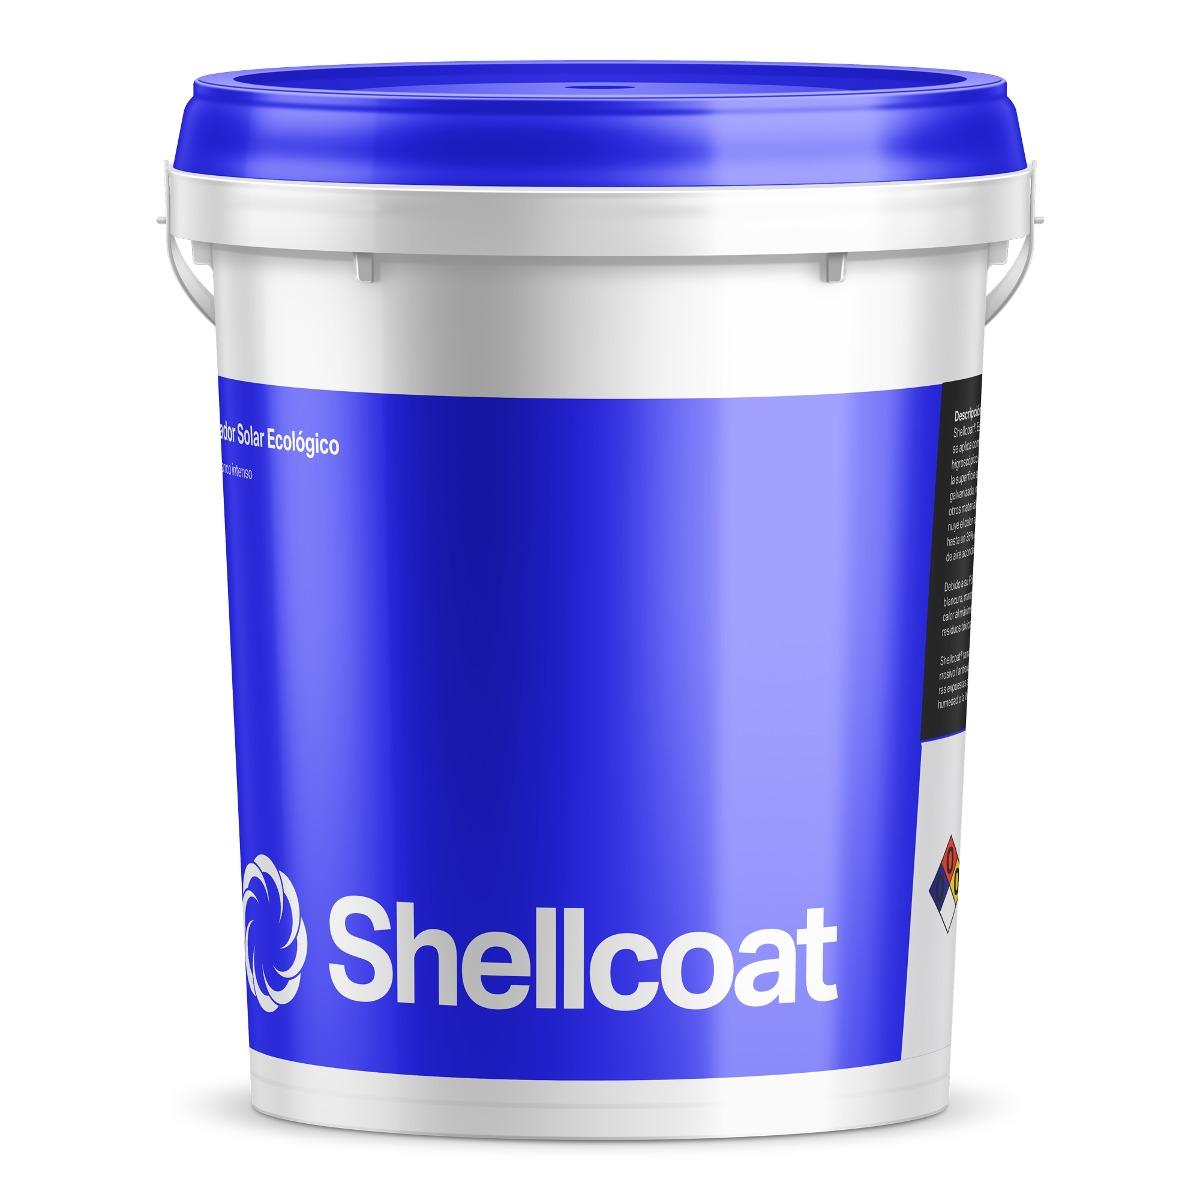 Aislante de calor para techos y paredes shellcoat - Pintura aislante termica interior ...